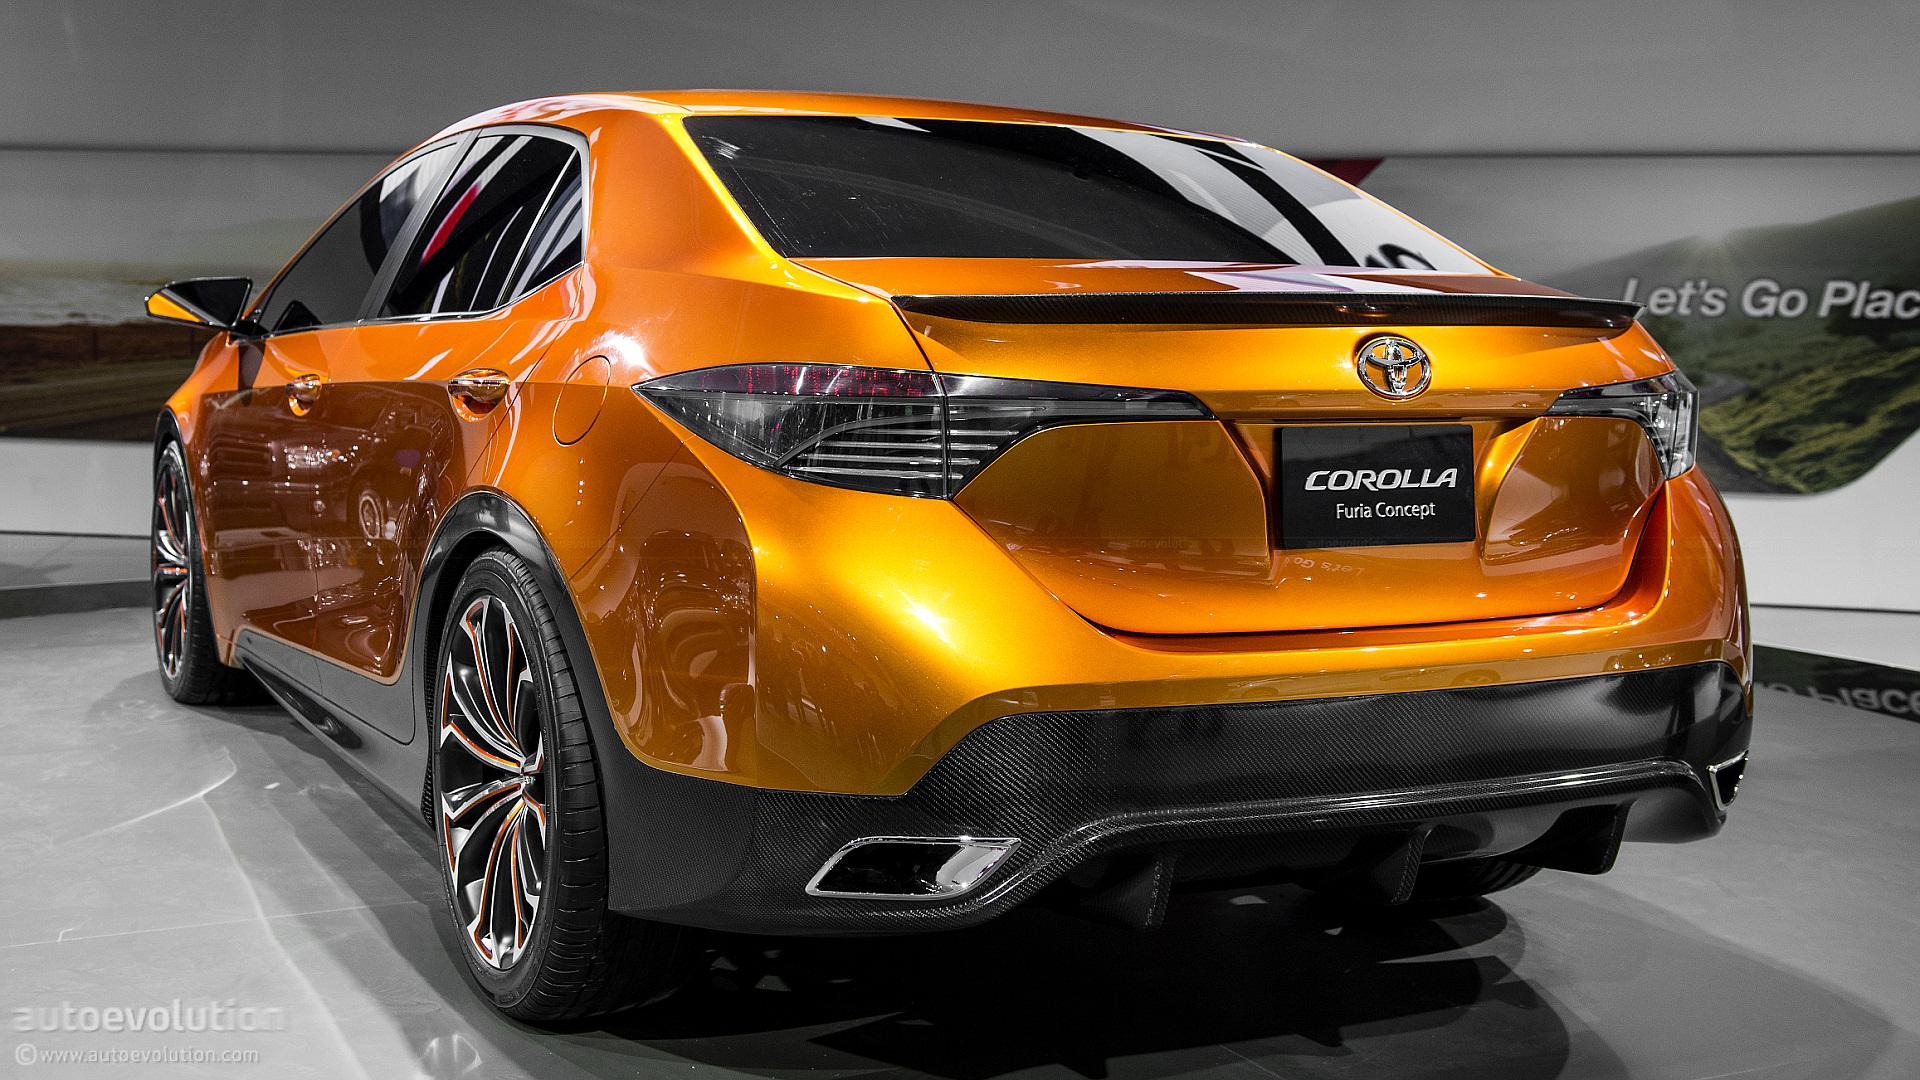 Toyota Chr Philippines >> 2013 NAIAS: Toyota Corolla Furia Concept [Live Photos] - autoevolution